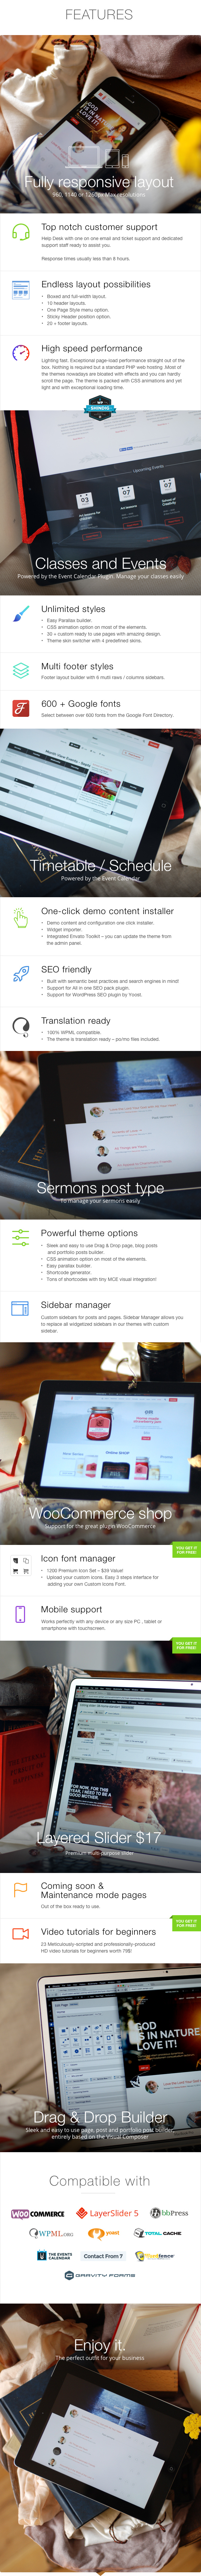 Features - Church  - WordPress